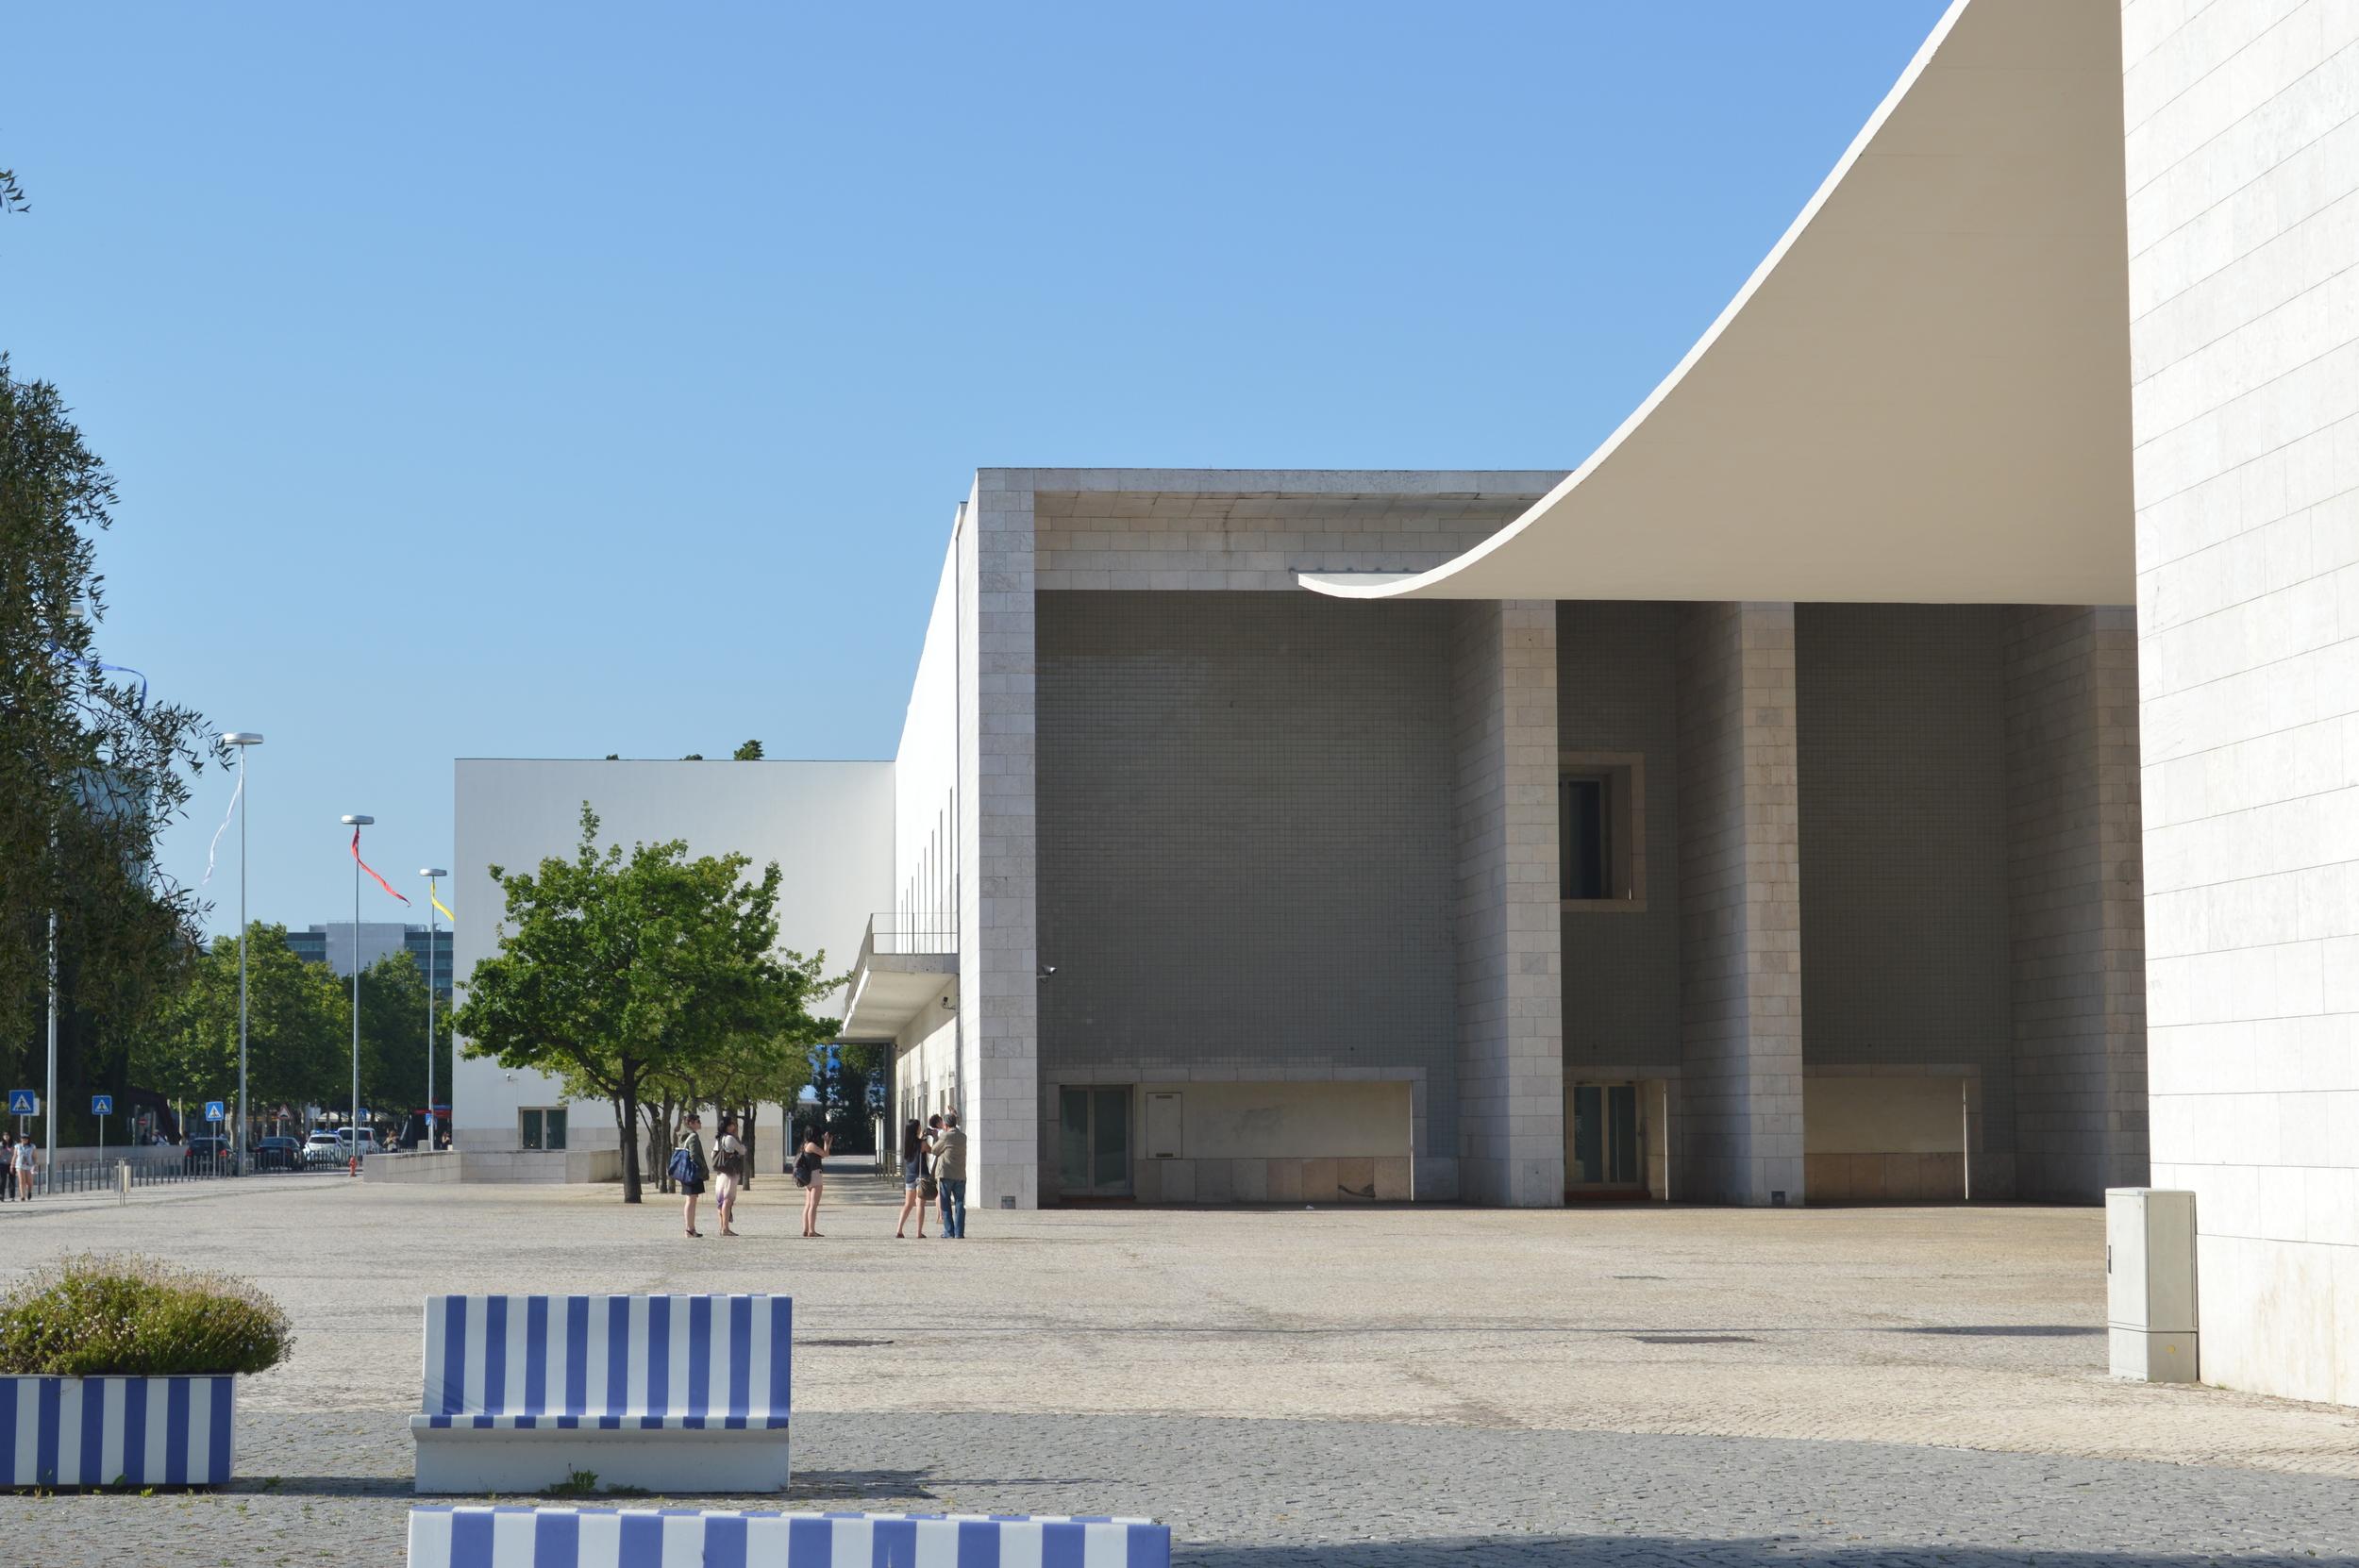 Expo '98 Portugal Pavilion